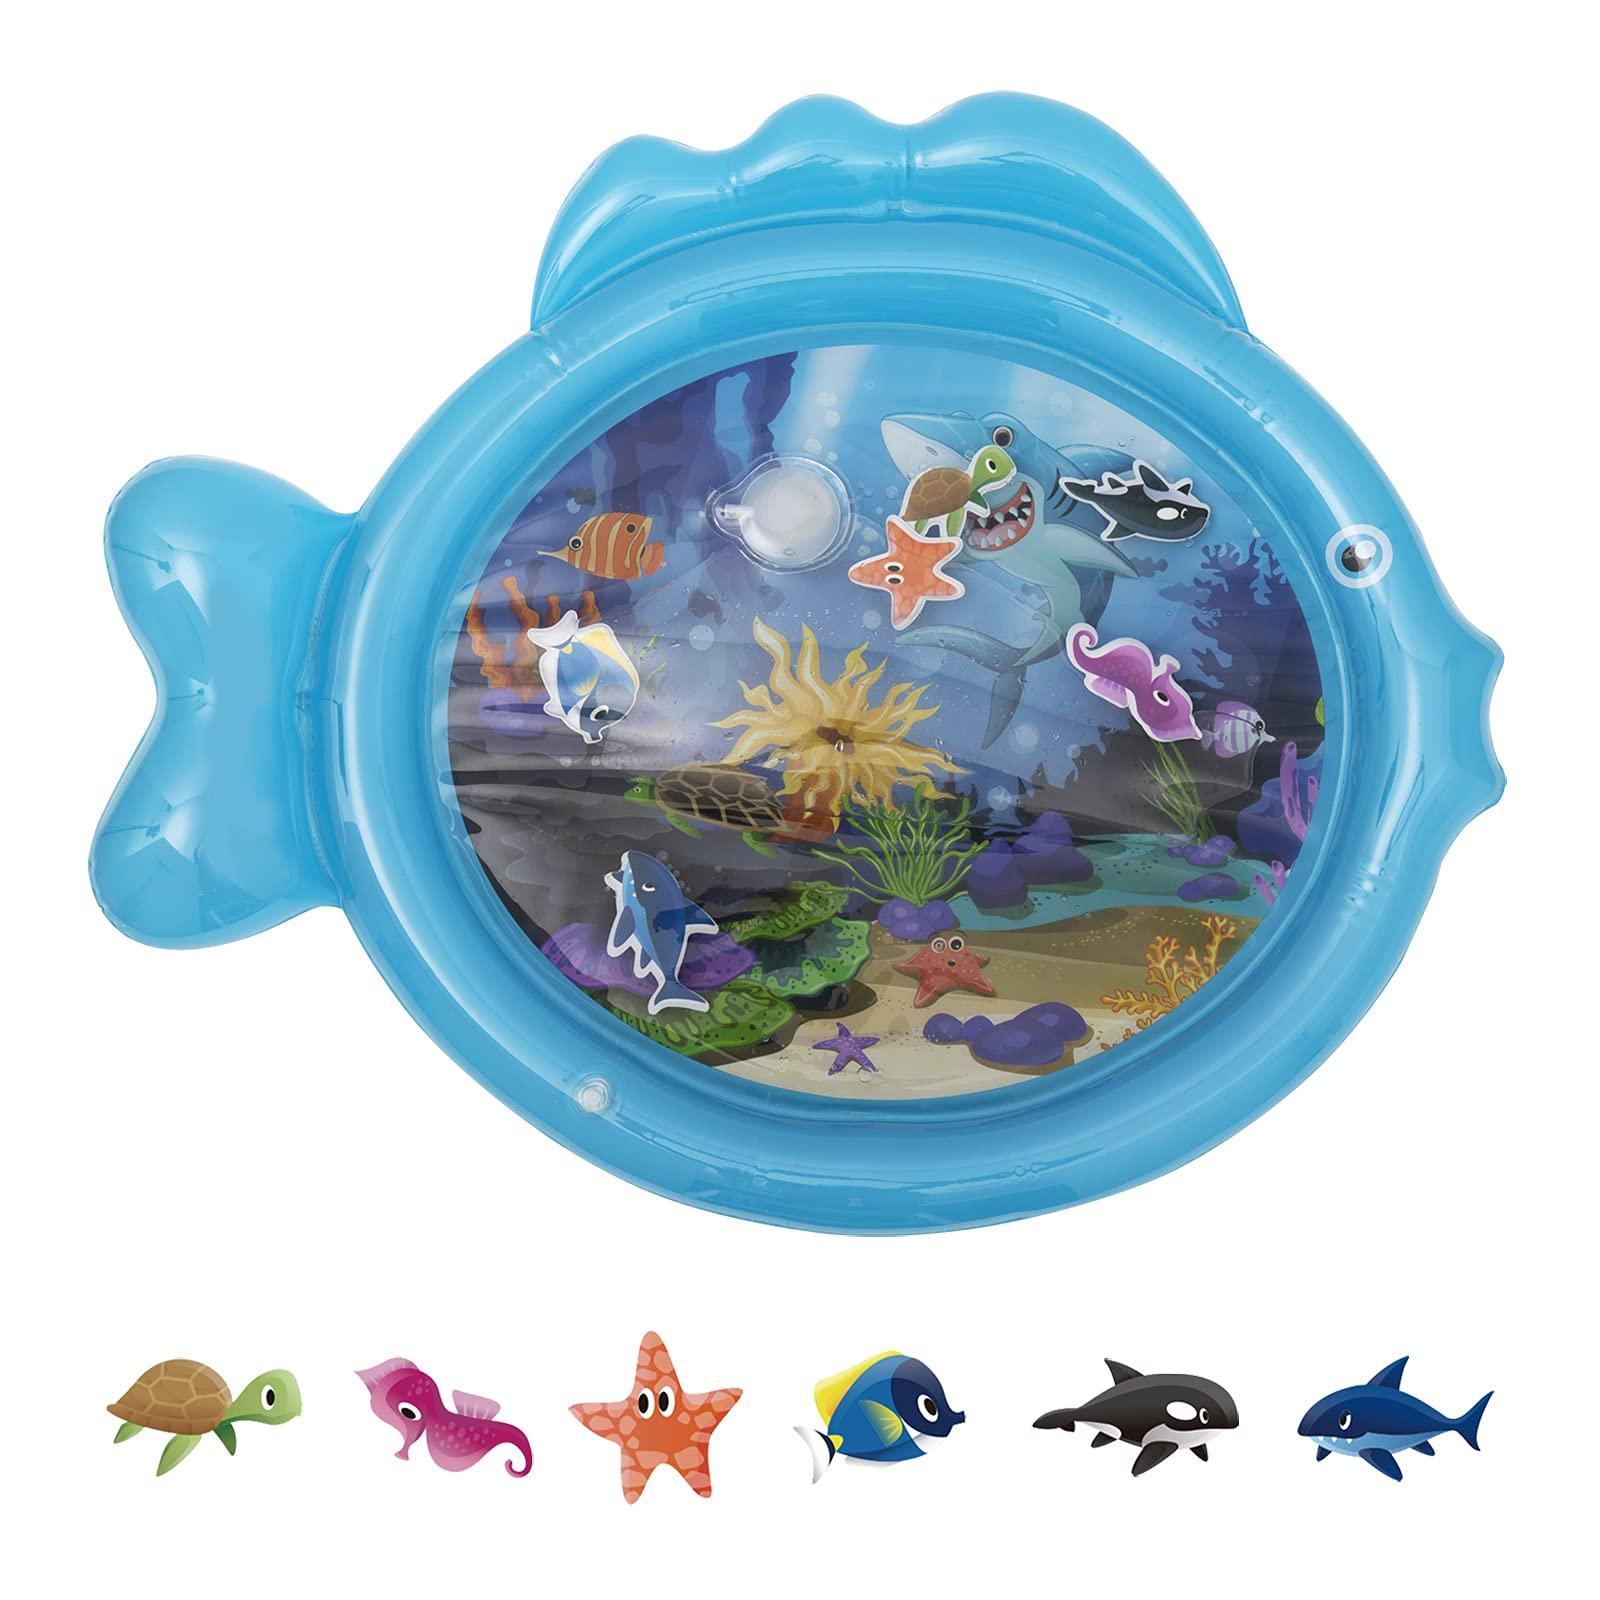 Baby Water Mat Inflatable Baby Water Play Mat Sensory Water Playmat Play